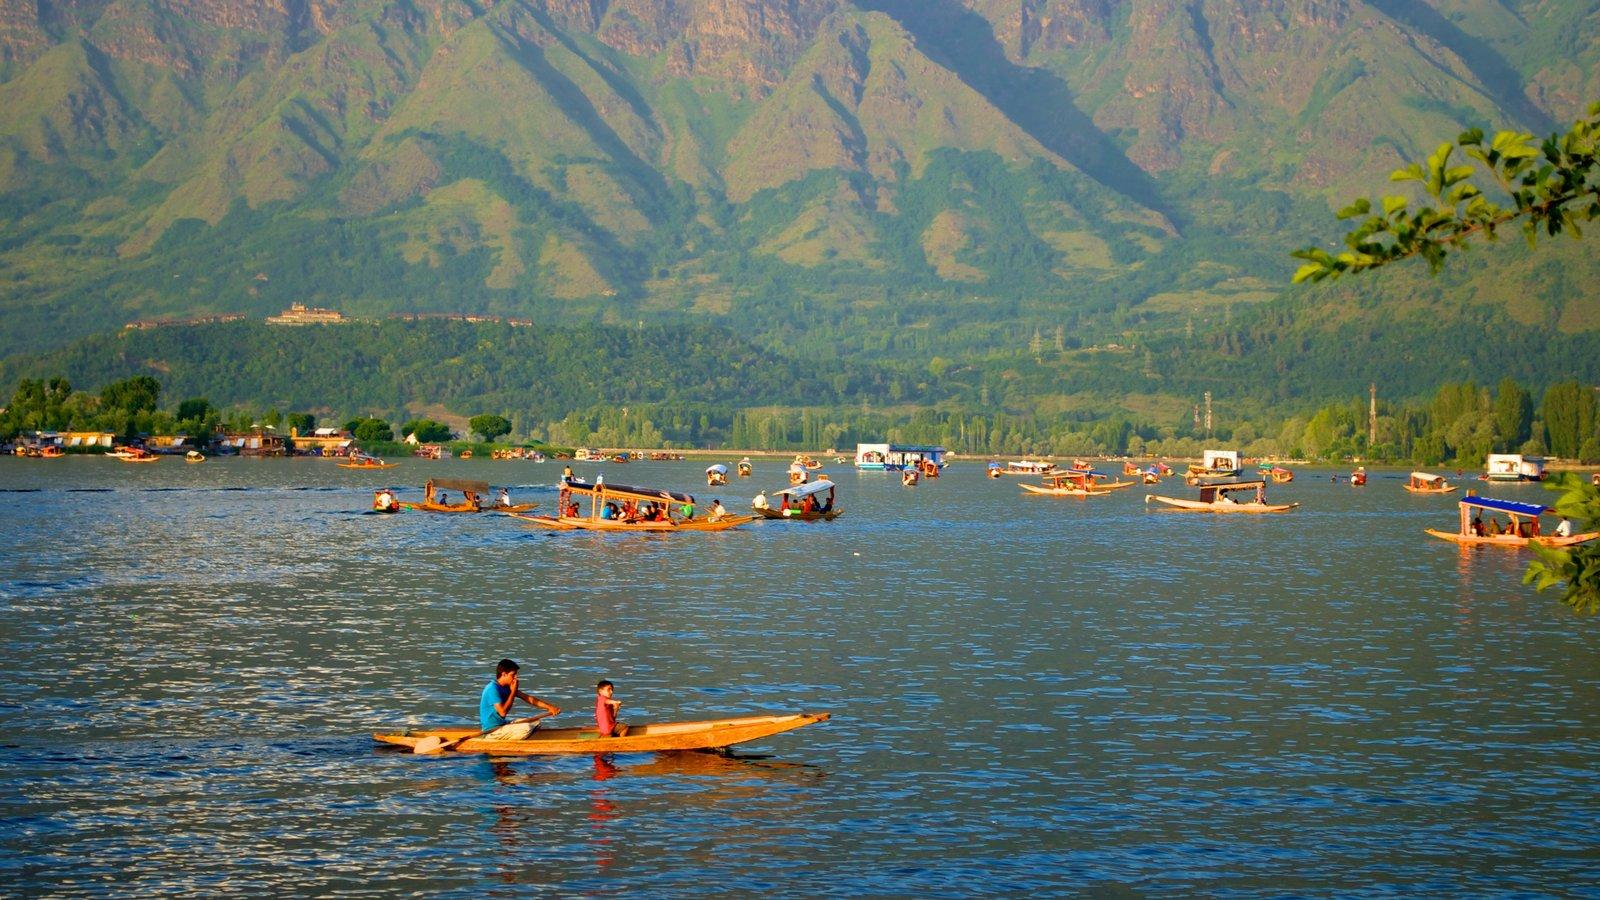 Srinagar featuring kayaking or canoeing and a lake or waterhole